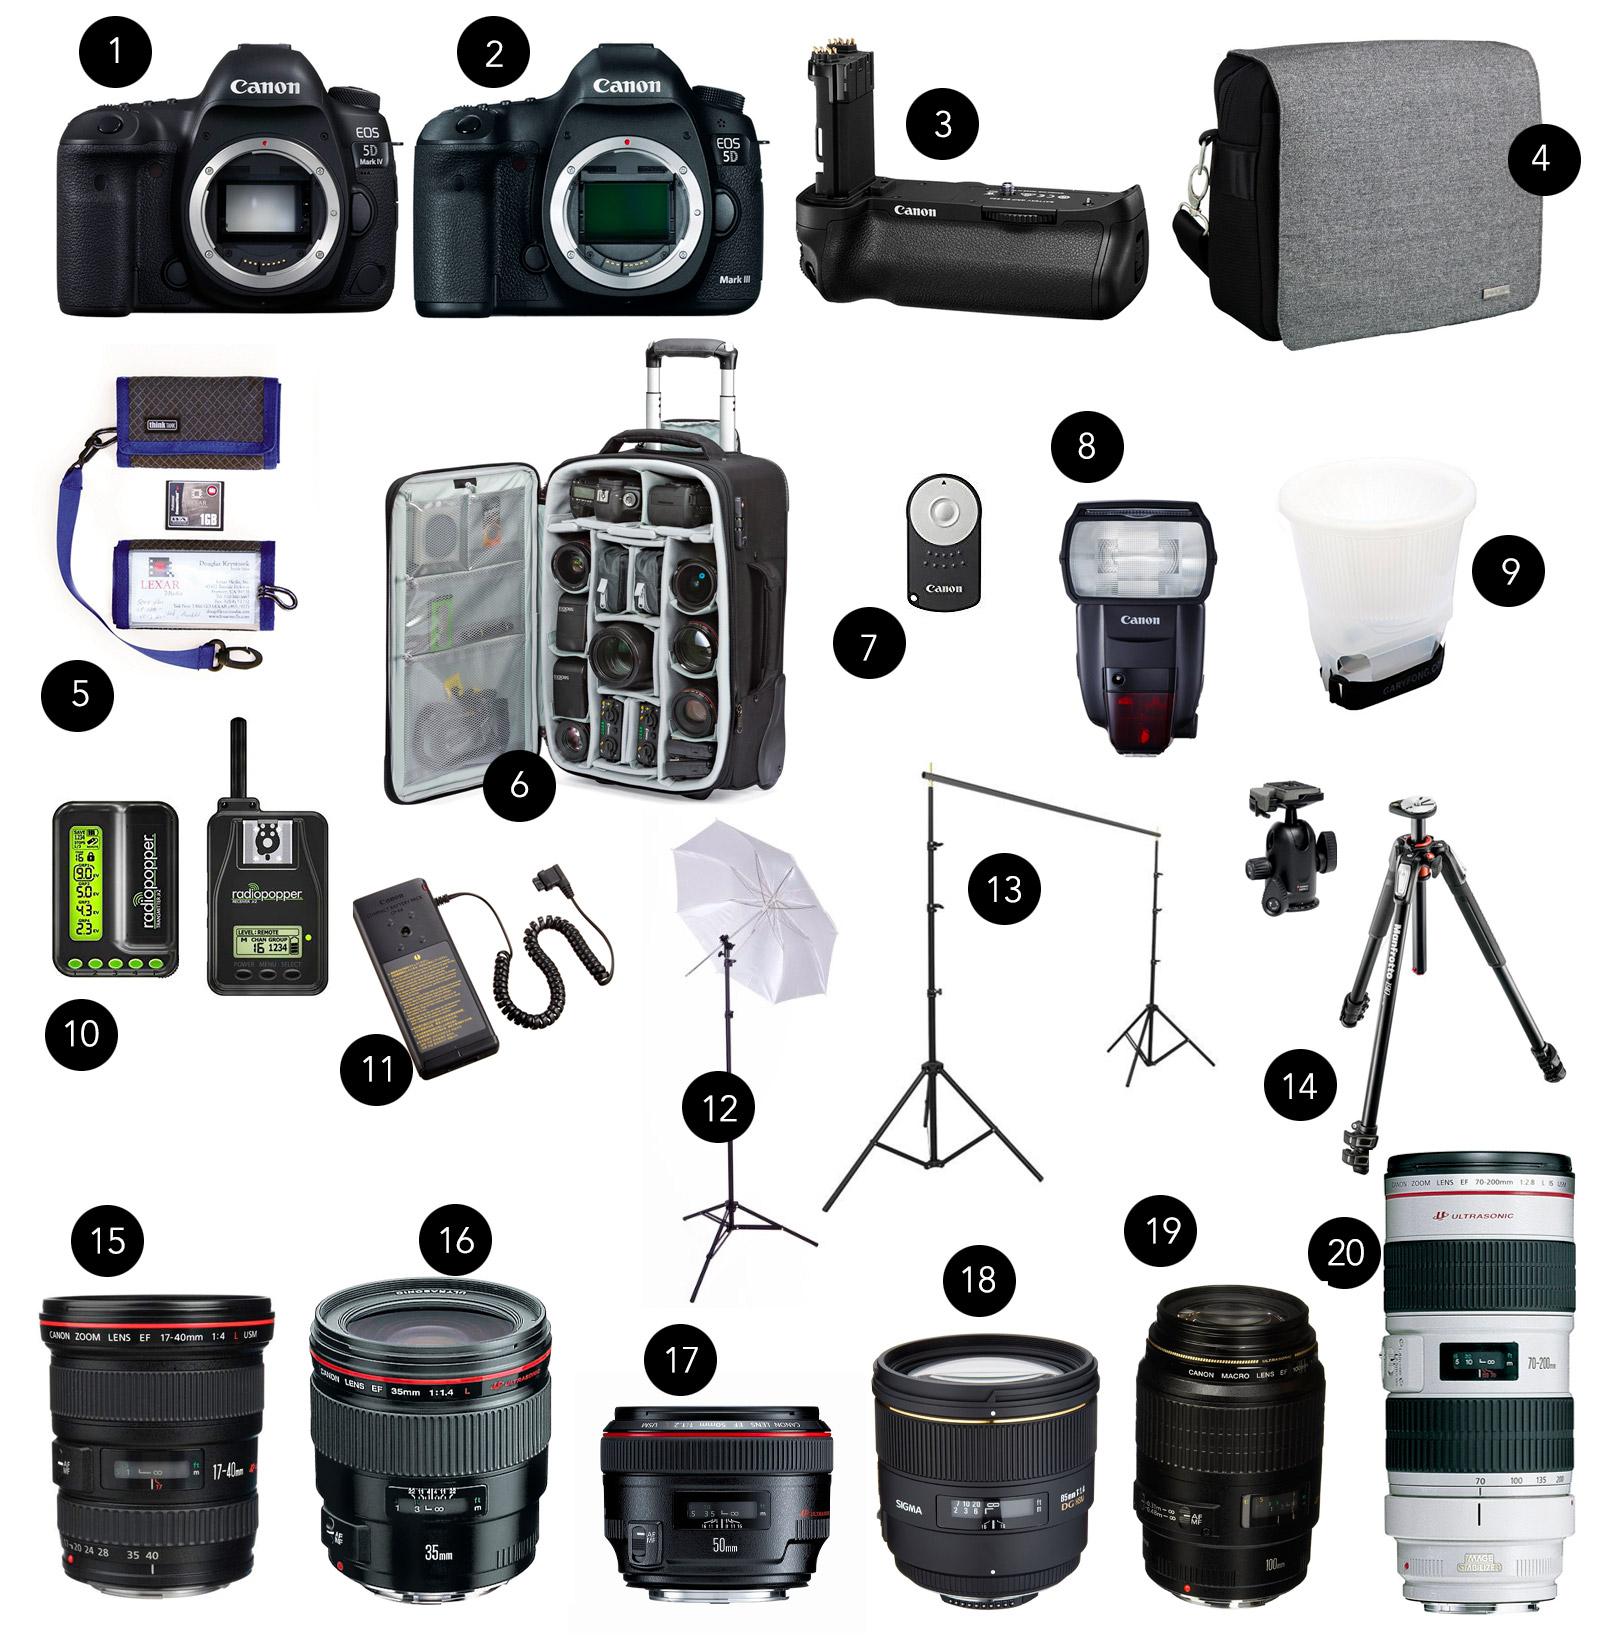 Phoenix Photographer Diana Elizabeth camera equipment in her camera bag